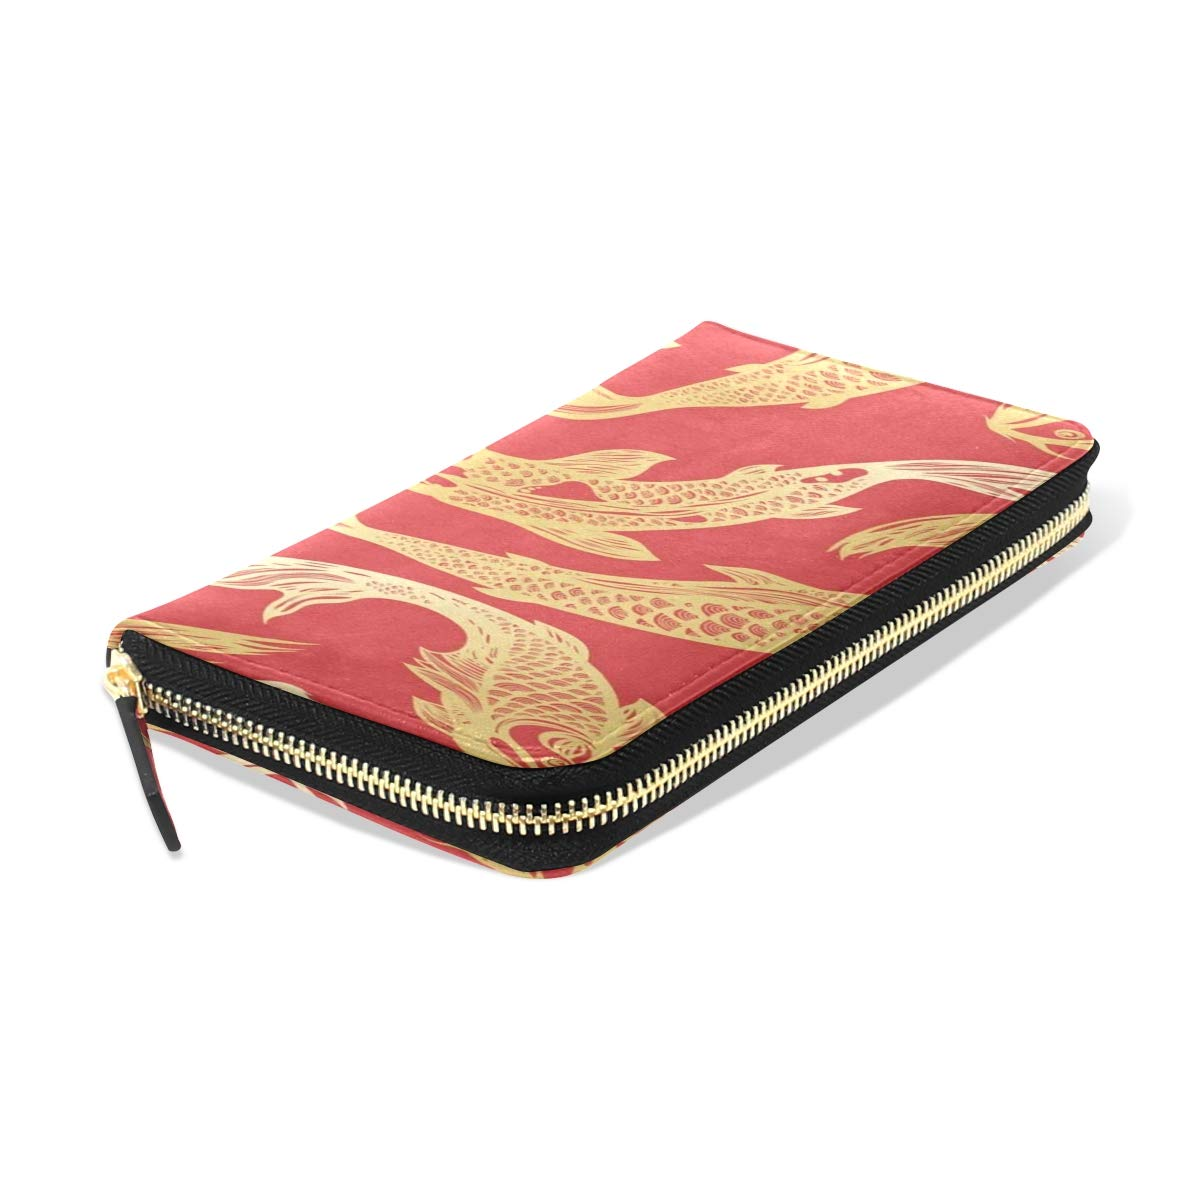 Womens Wallets Tribal Ethnic Camel Portrait Leather Passport Wallet Coin Purse Girls Handbags